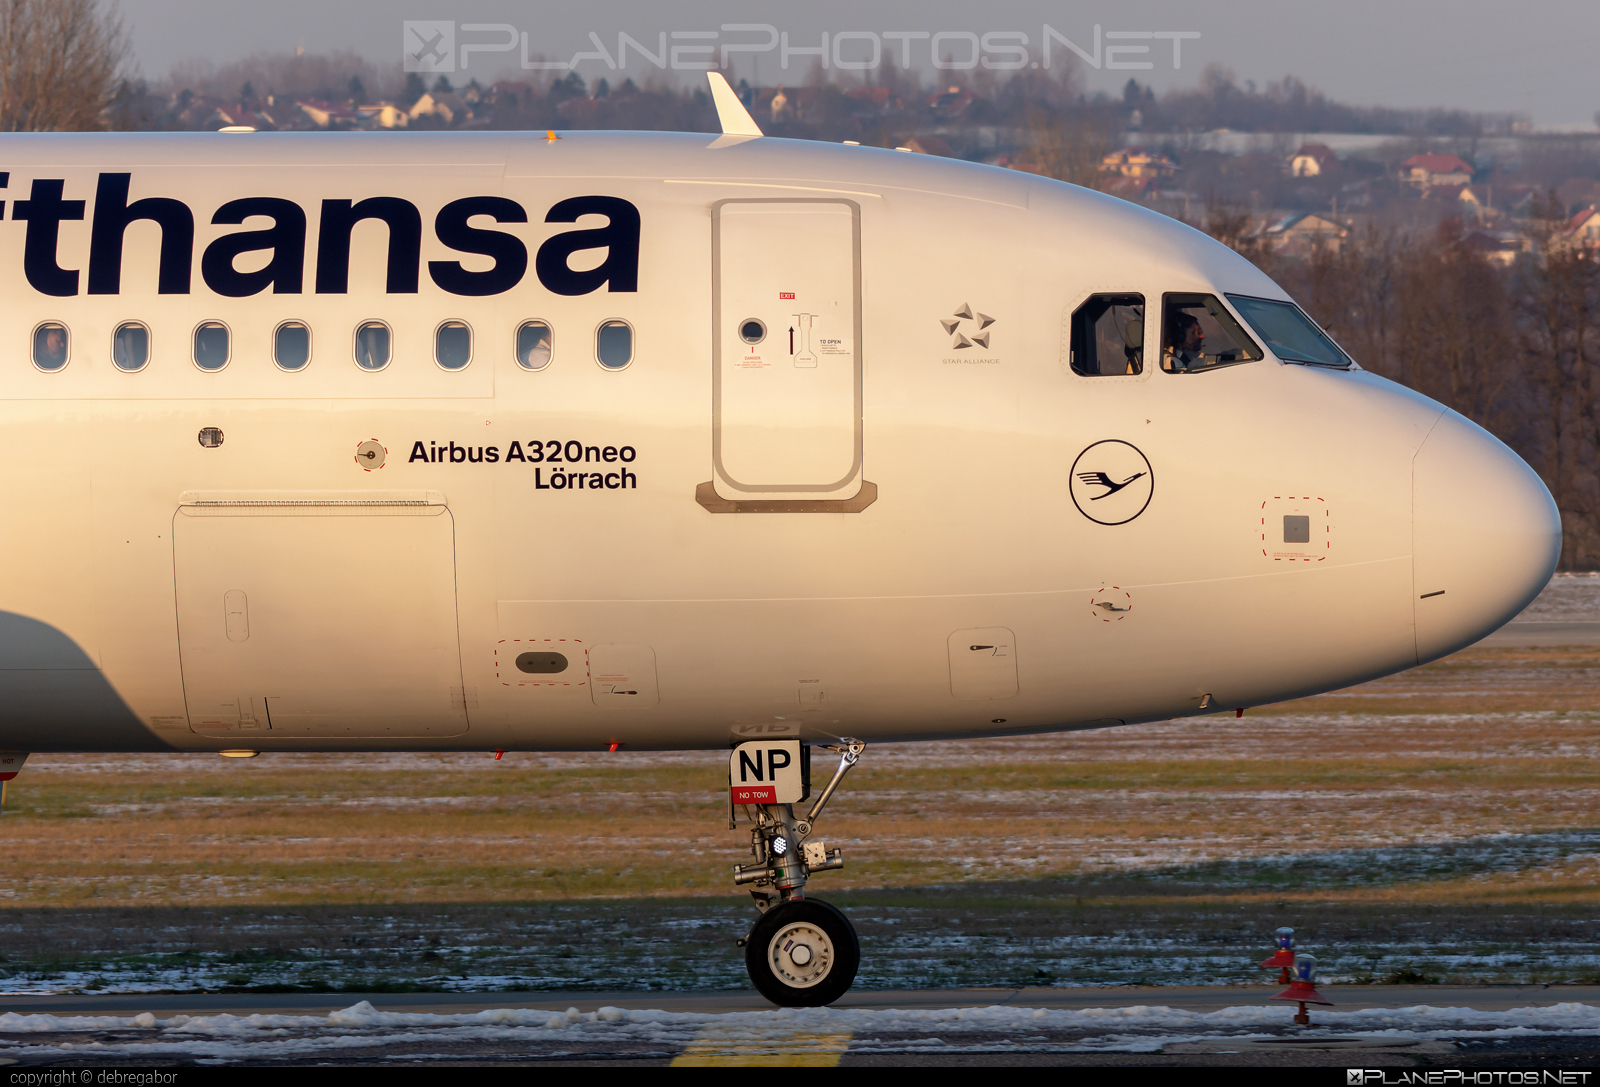 Airbus A320-271N - D-AINP operated by Lufthansa #a320 #a320family #a320neo #airbus #airbus320 #lufthansa